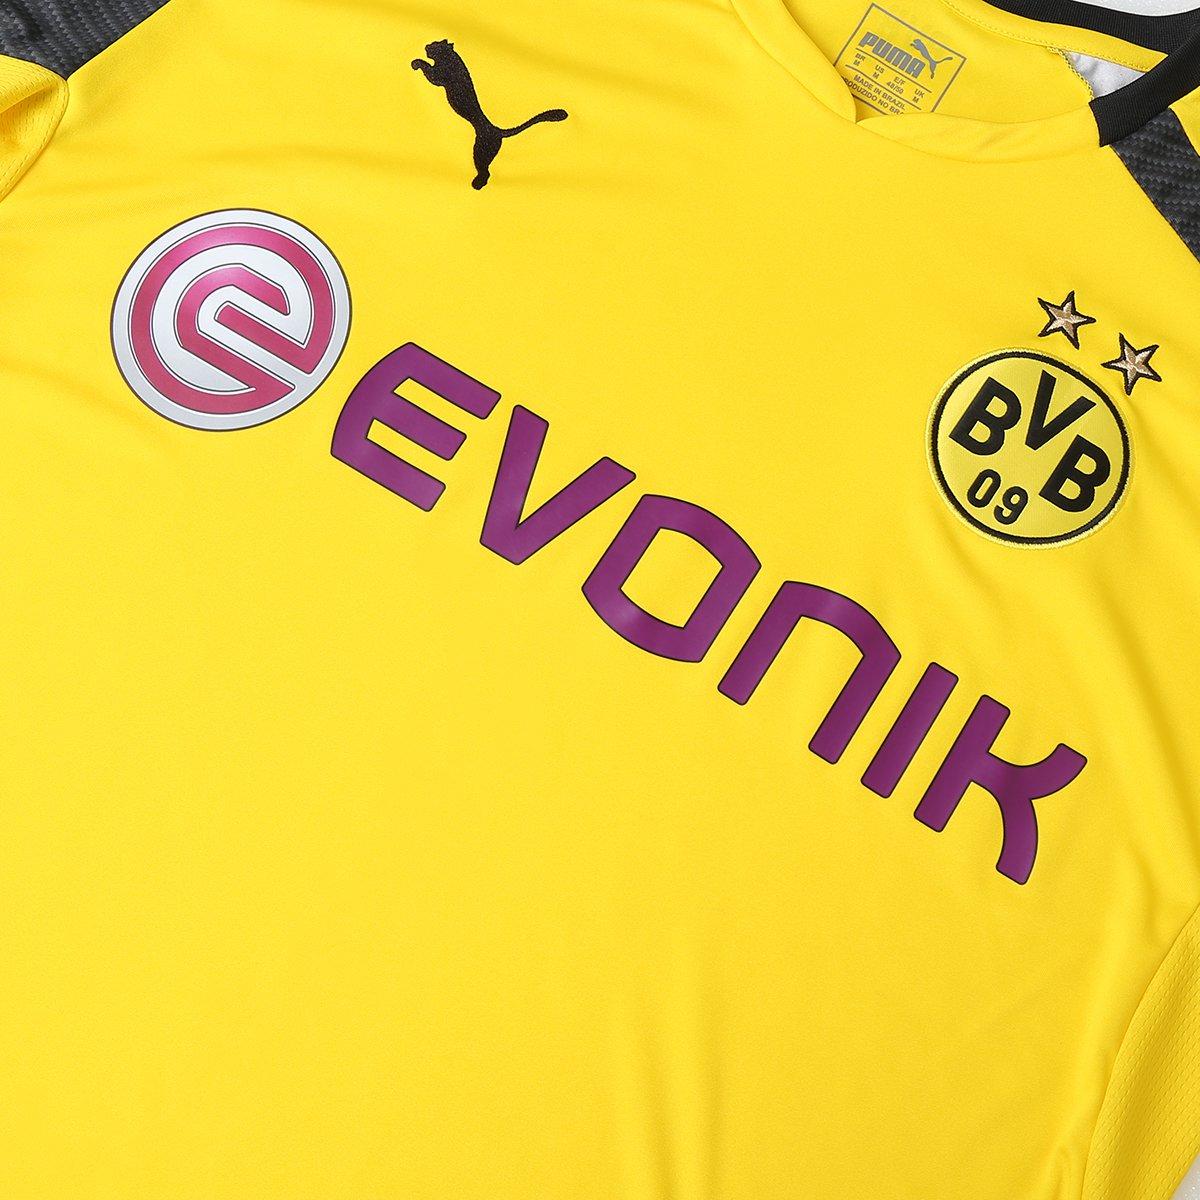 ... Camisa Borussia Dortmund Third 16 17 s nº Torcedor Puma Masculina ...  e91bd26acc58d8 ... ac8e894c78a5b